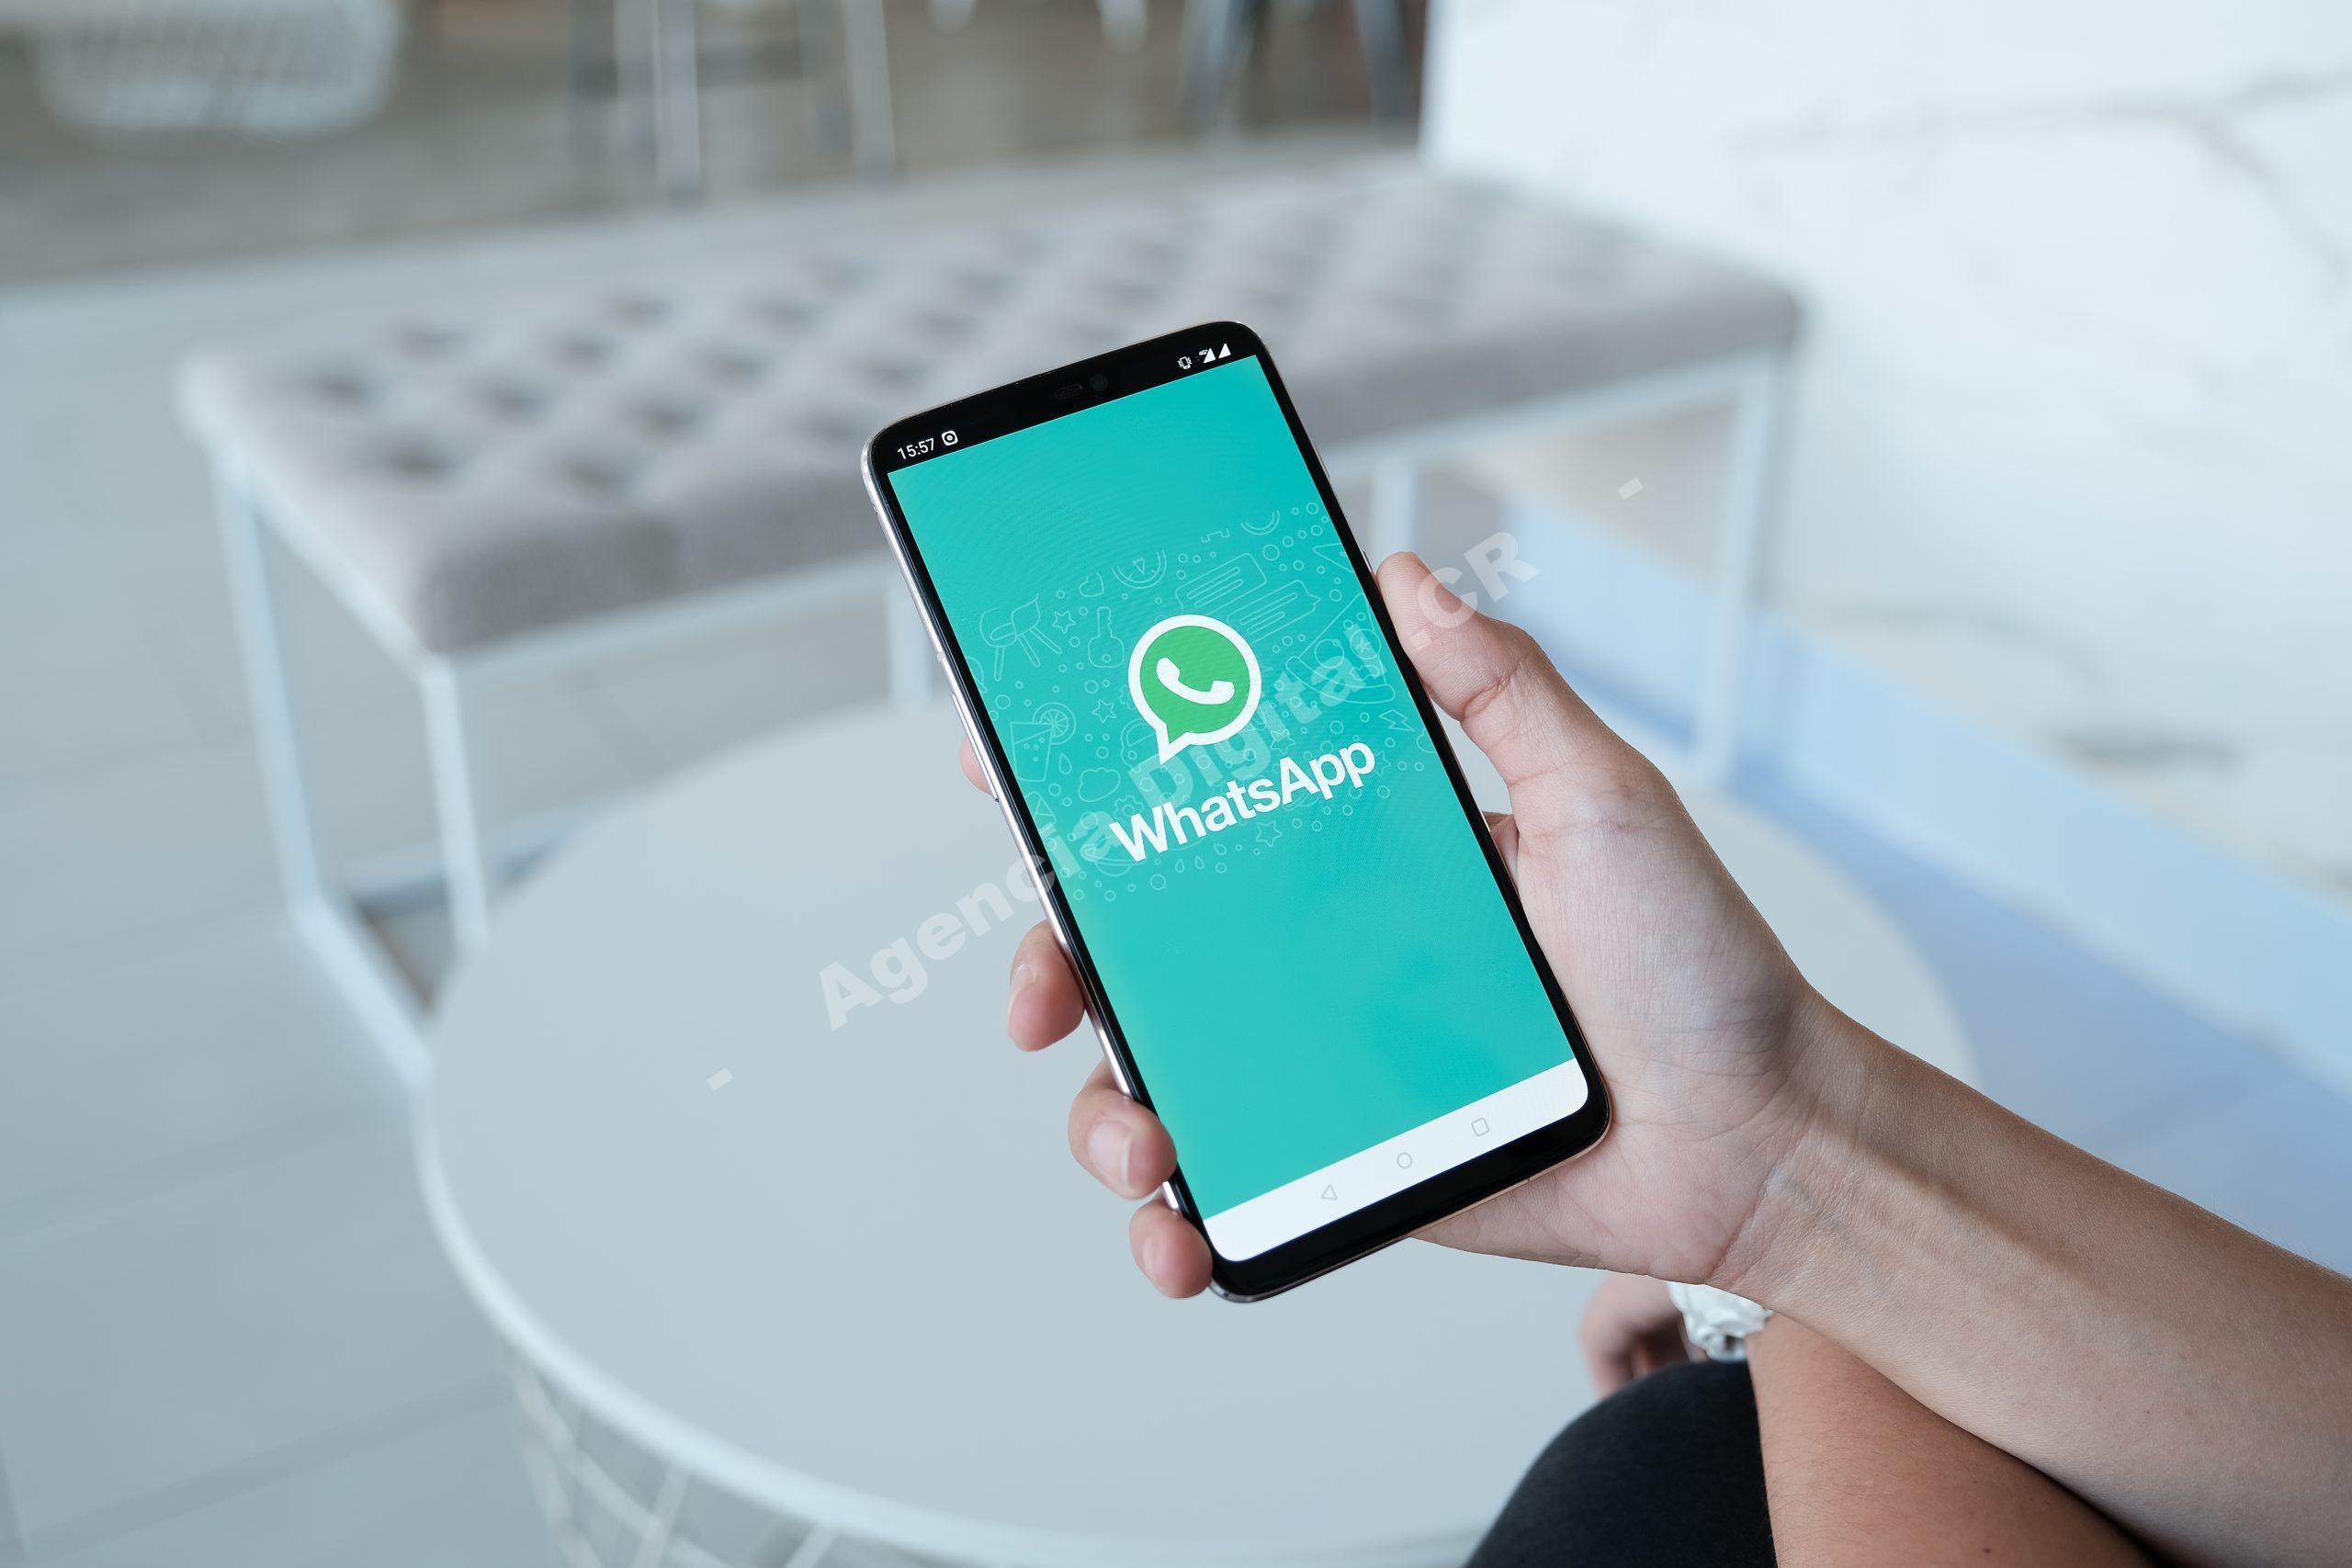 WhatsApp Agencia Digital de Costa Rica